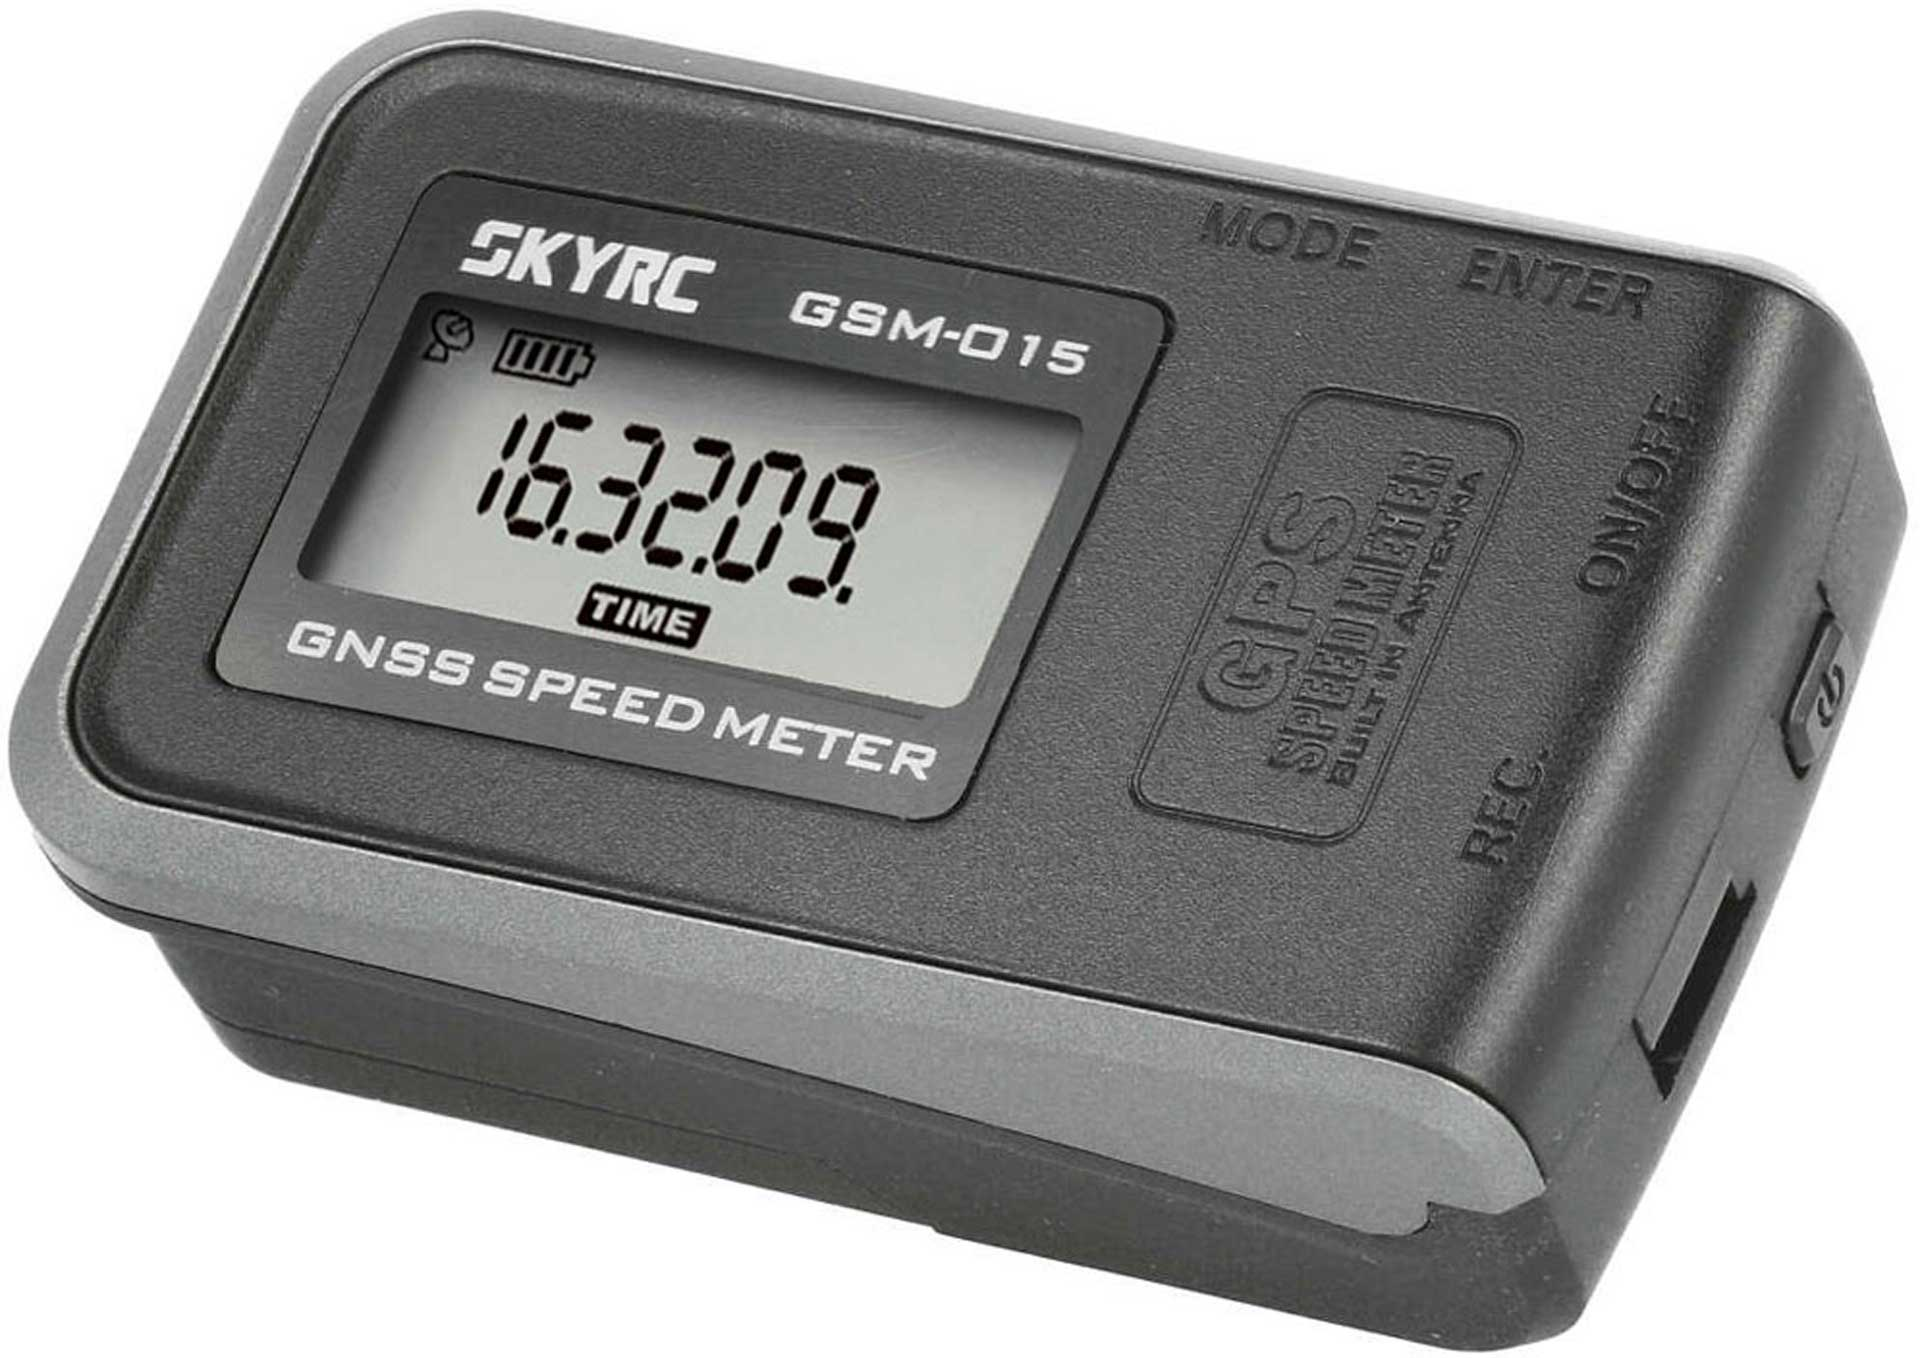 SKYRC GPS SPEED MEASURING DEVICE GSM-015 GNSS SPEED METER